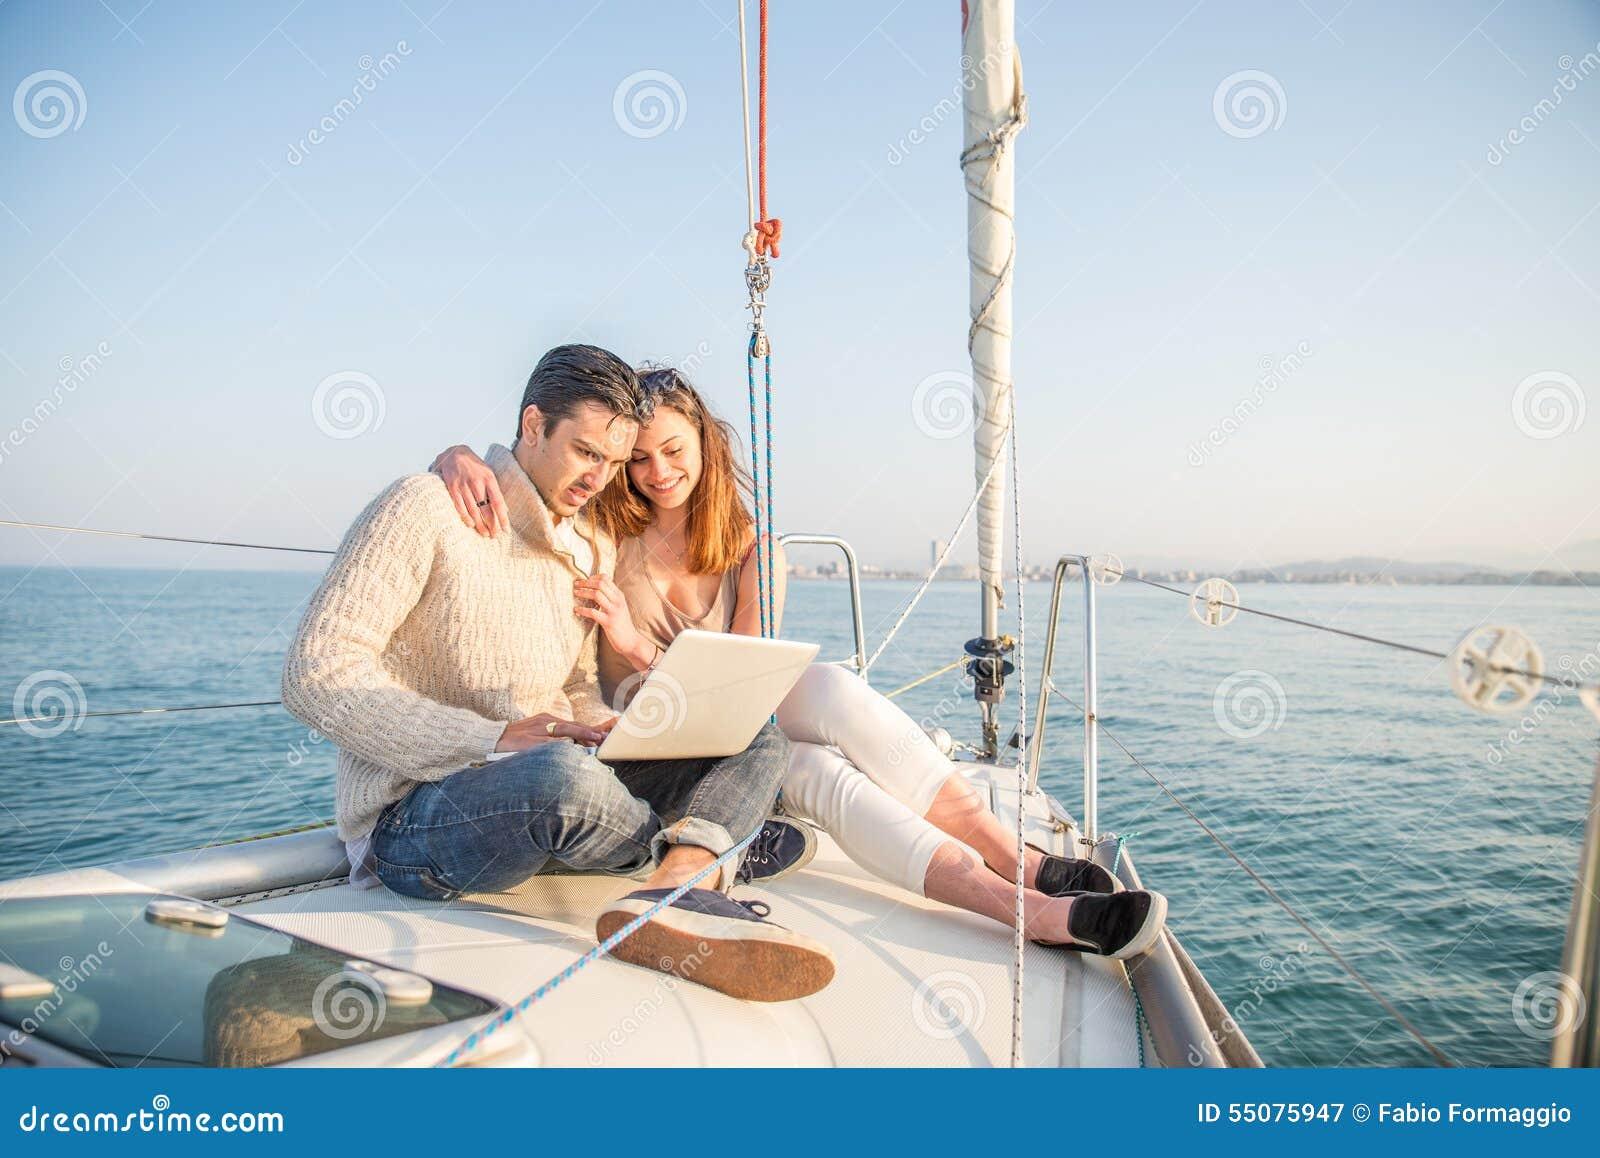 yachts on Women models